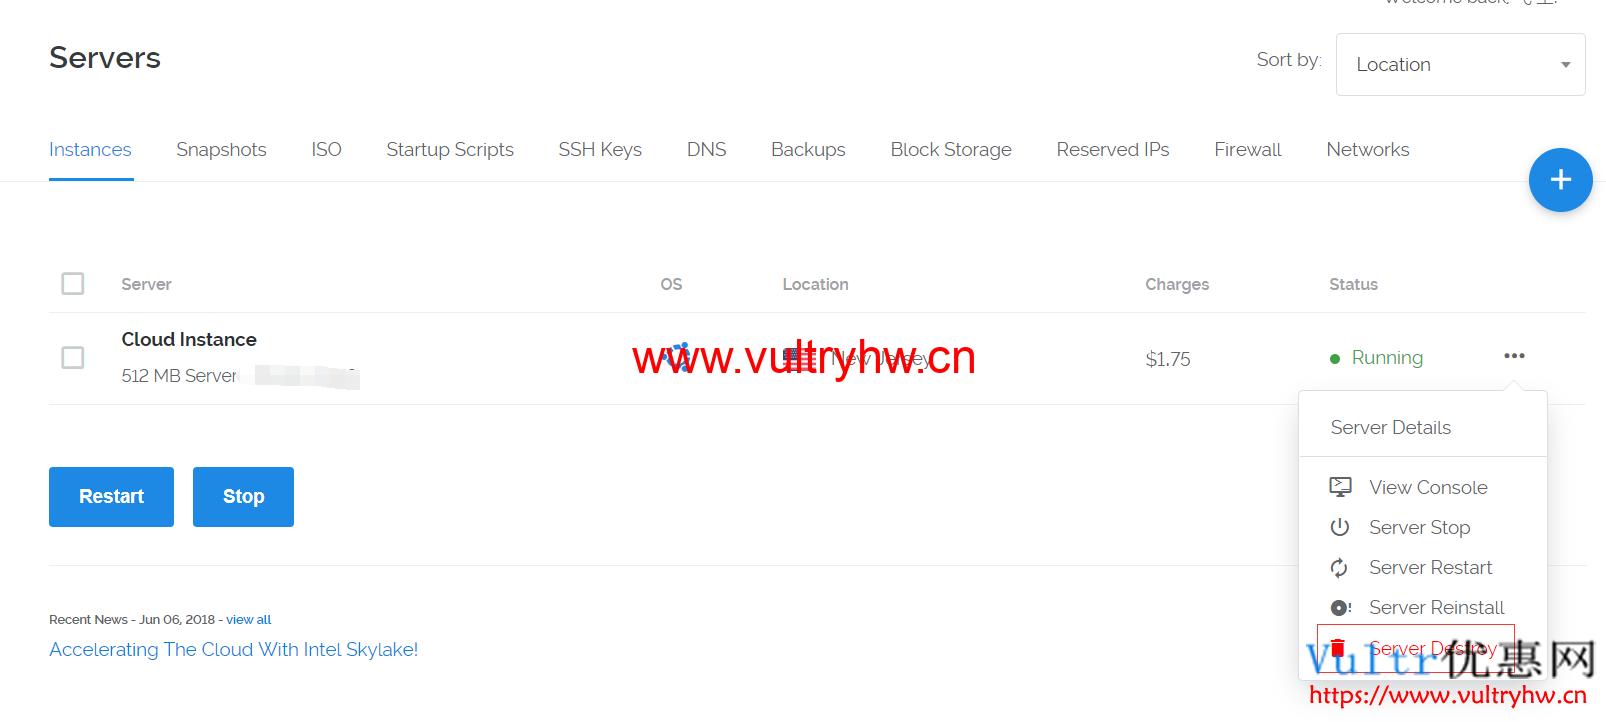 Vultr暂停后(Server Stop)还扣费吗